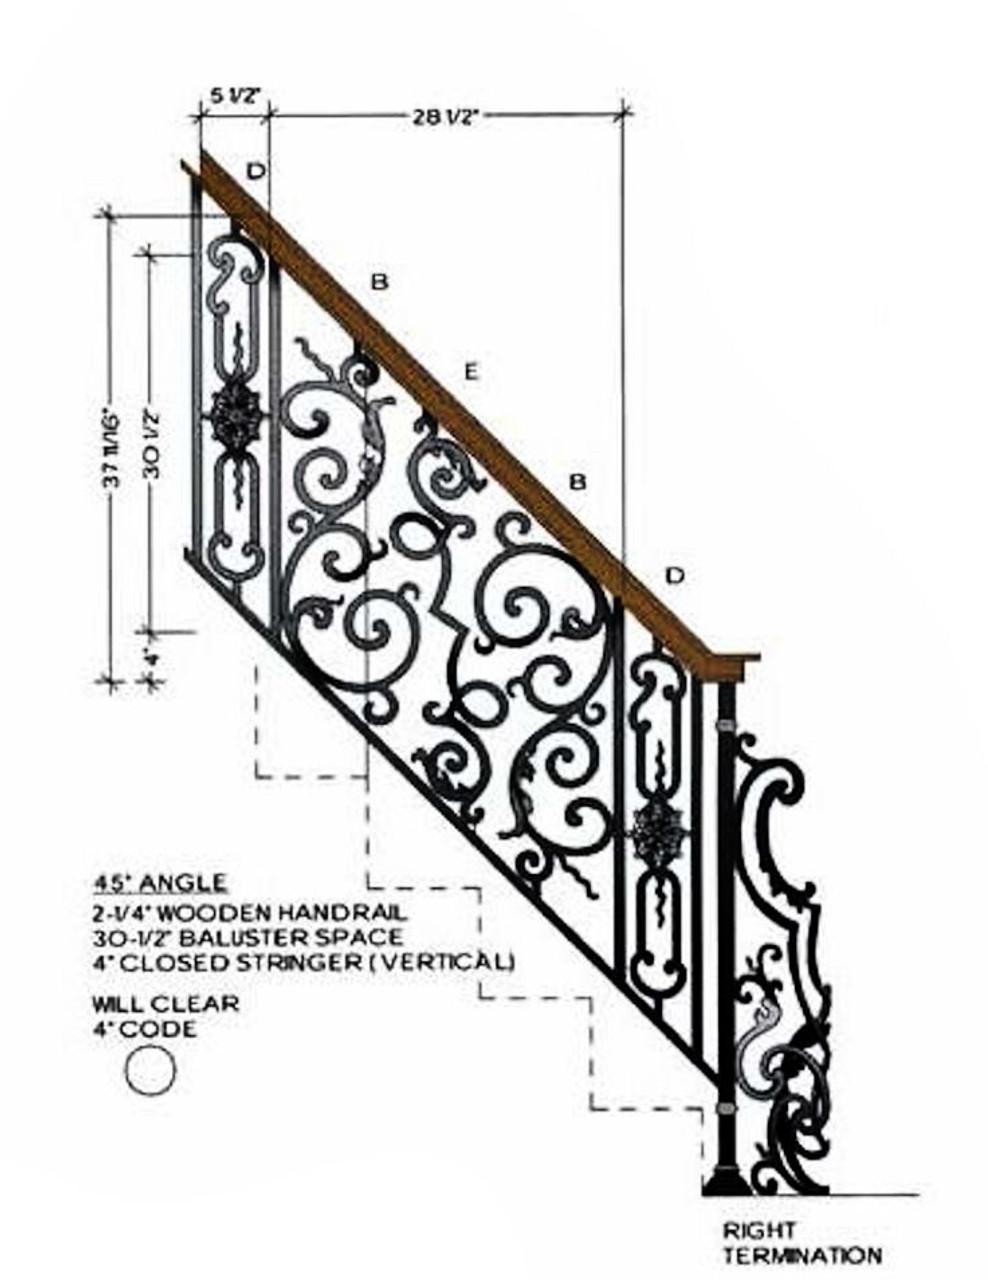 HFBX.E2 Bordeaux Rake Iron Panel in 45-degre angled staircase